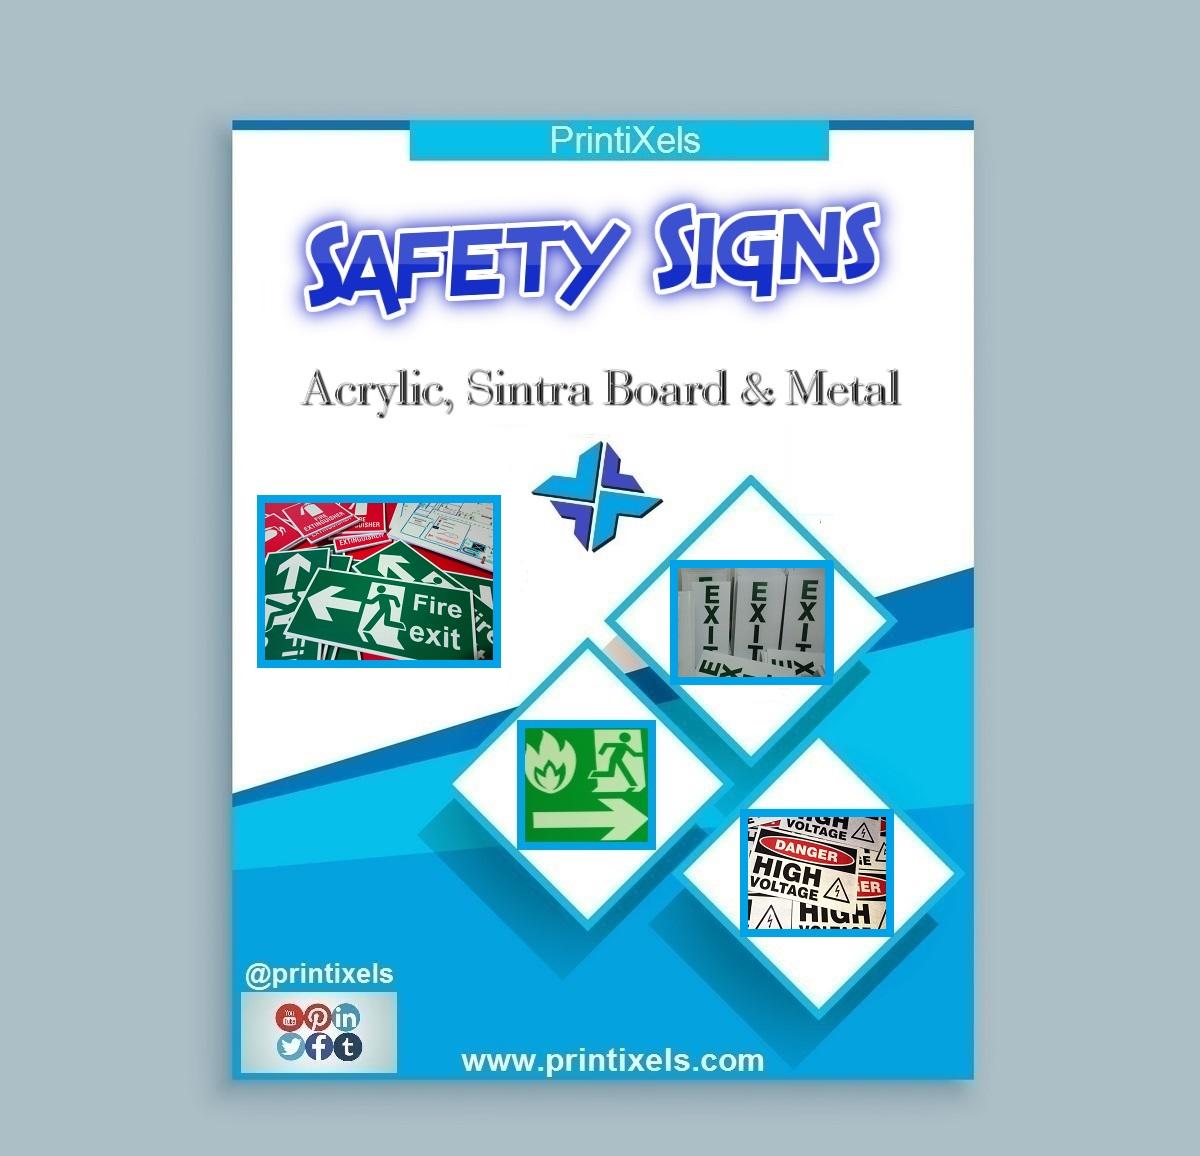 Safety Signs - Acrylic, Sintra Board & Metal